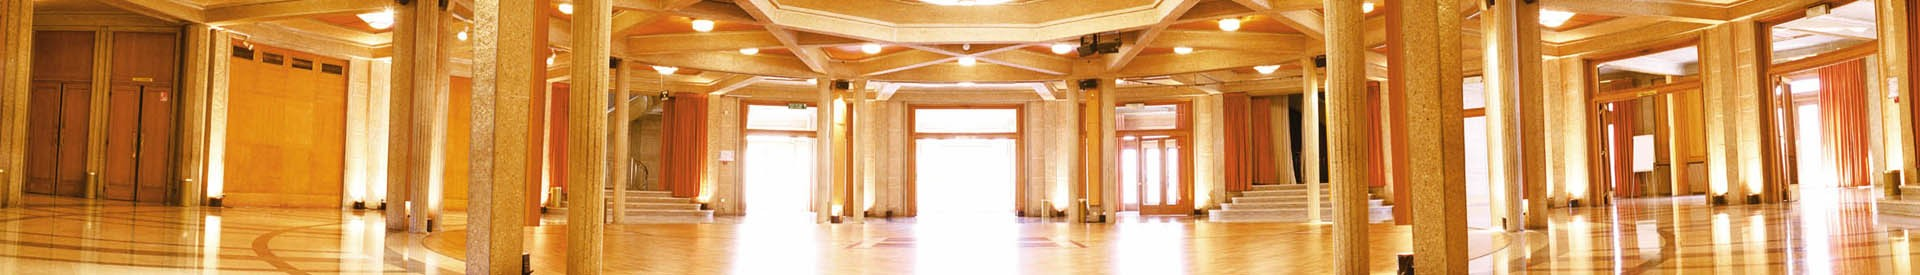 Palacio de congreso de Versalles